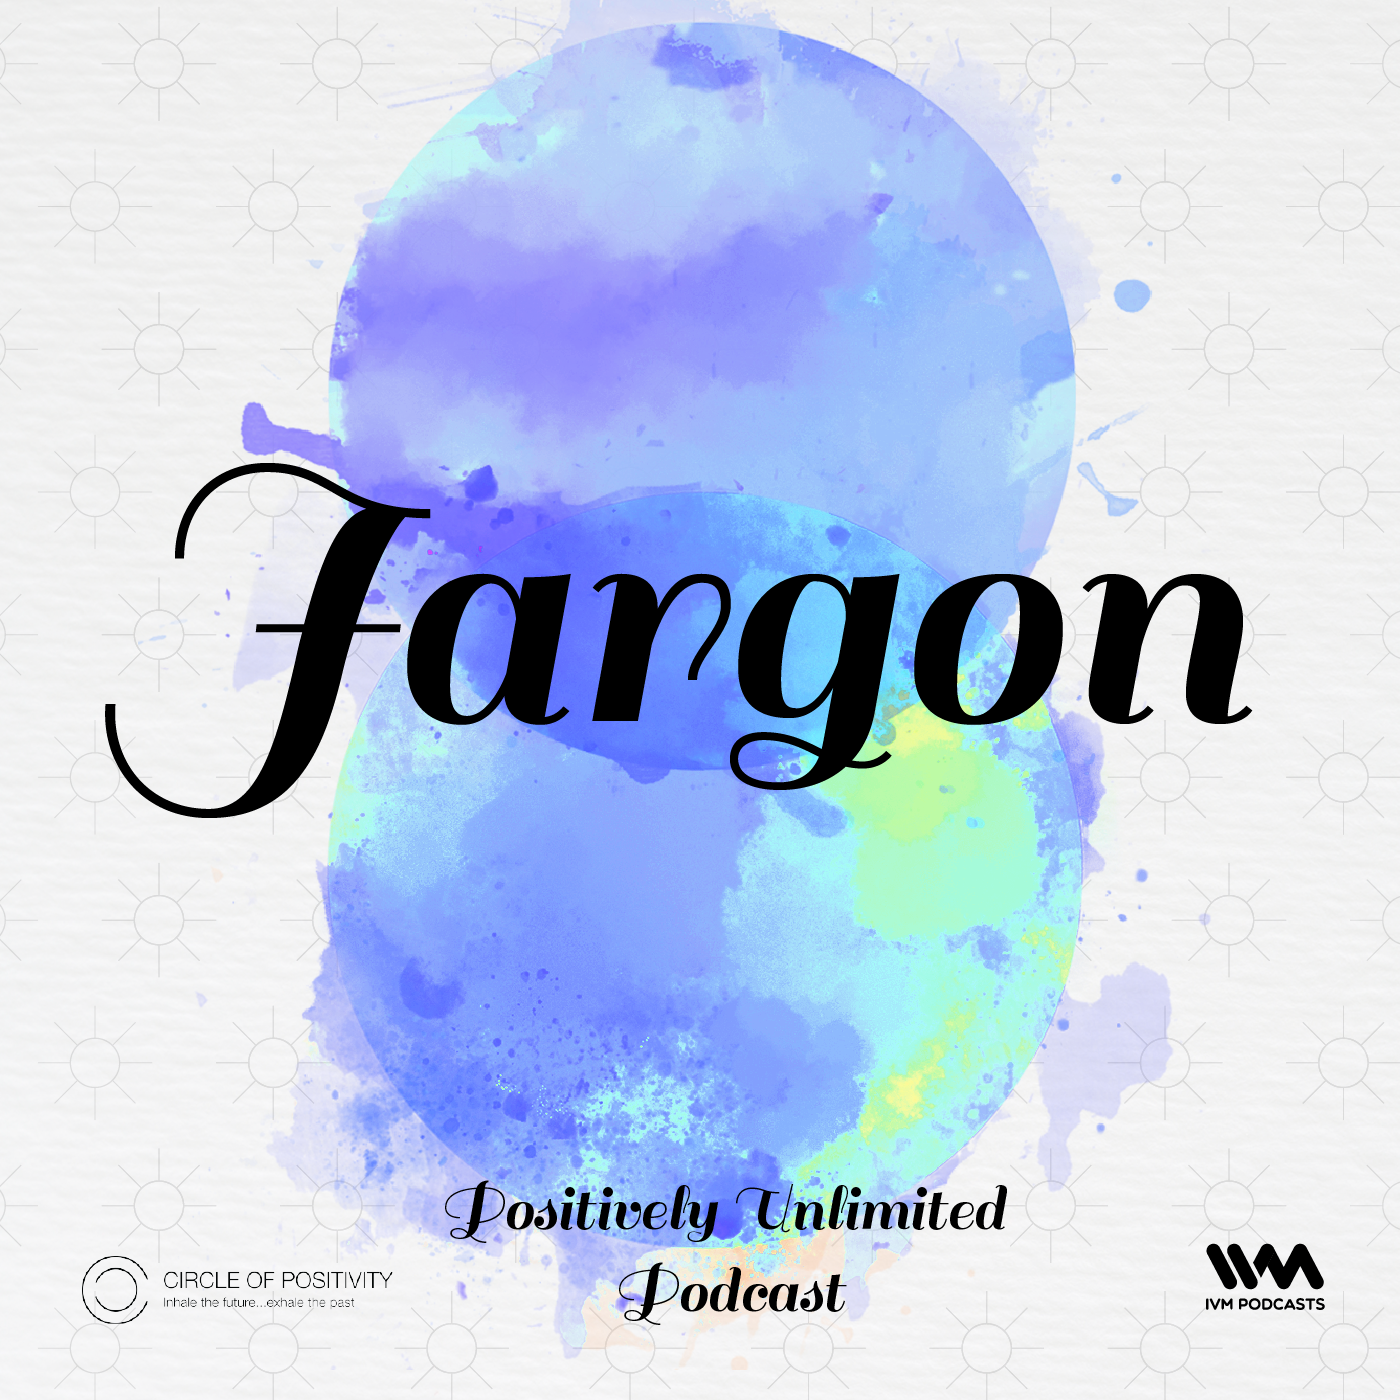 Ep. 108: Jargon